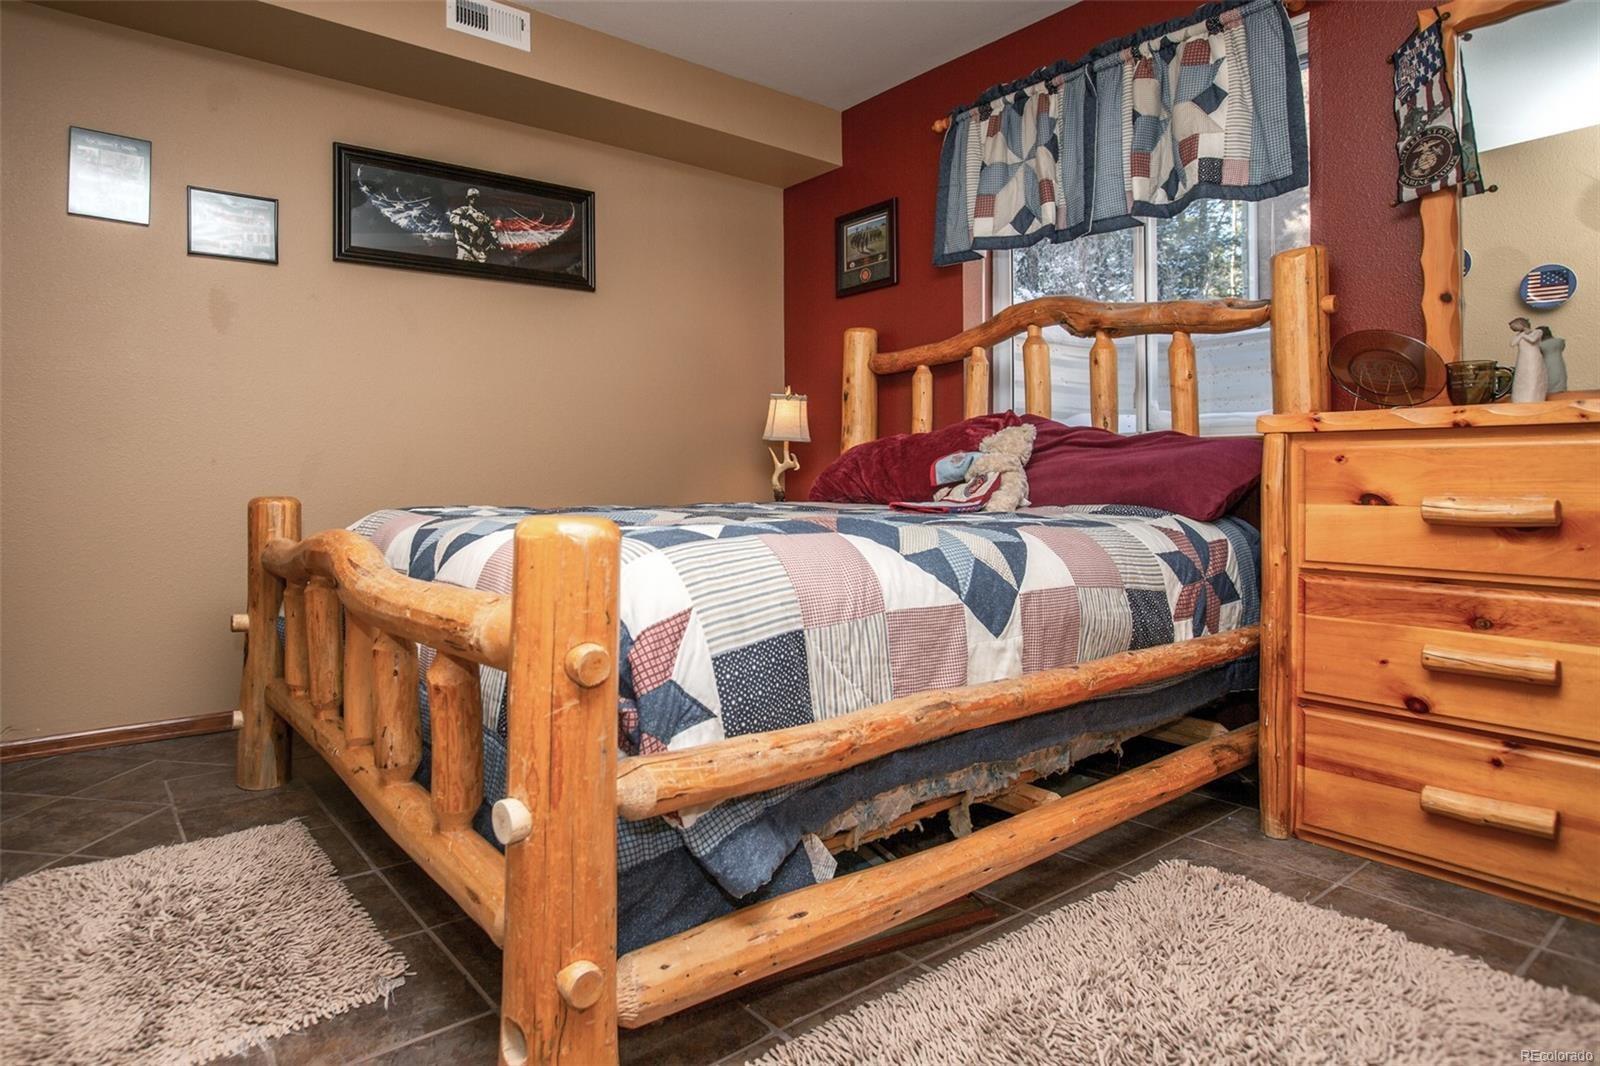 MLS# 8599762 - 551  Donzi Trail, Florissant, CO 80816